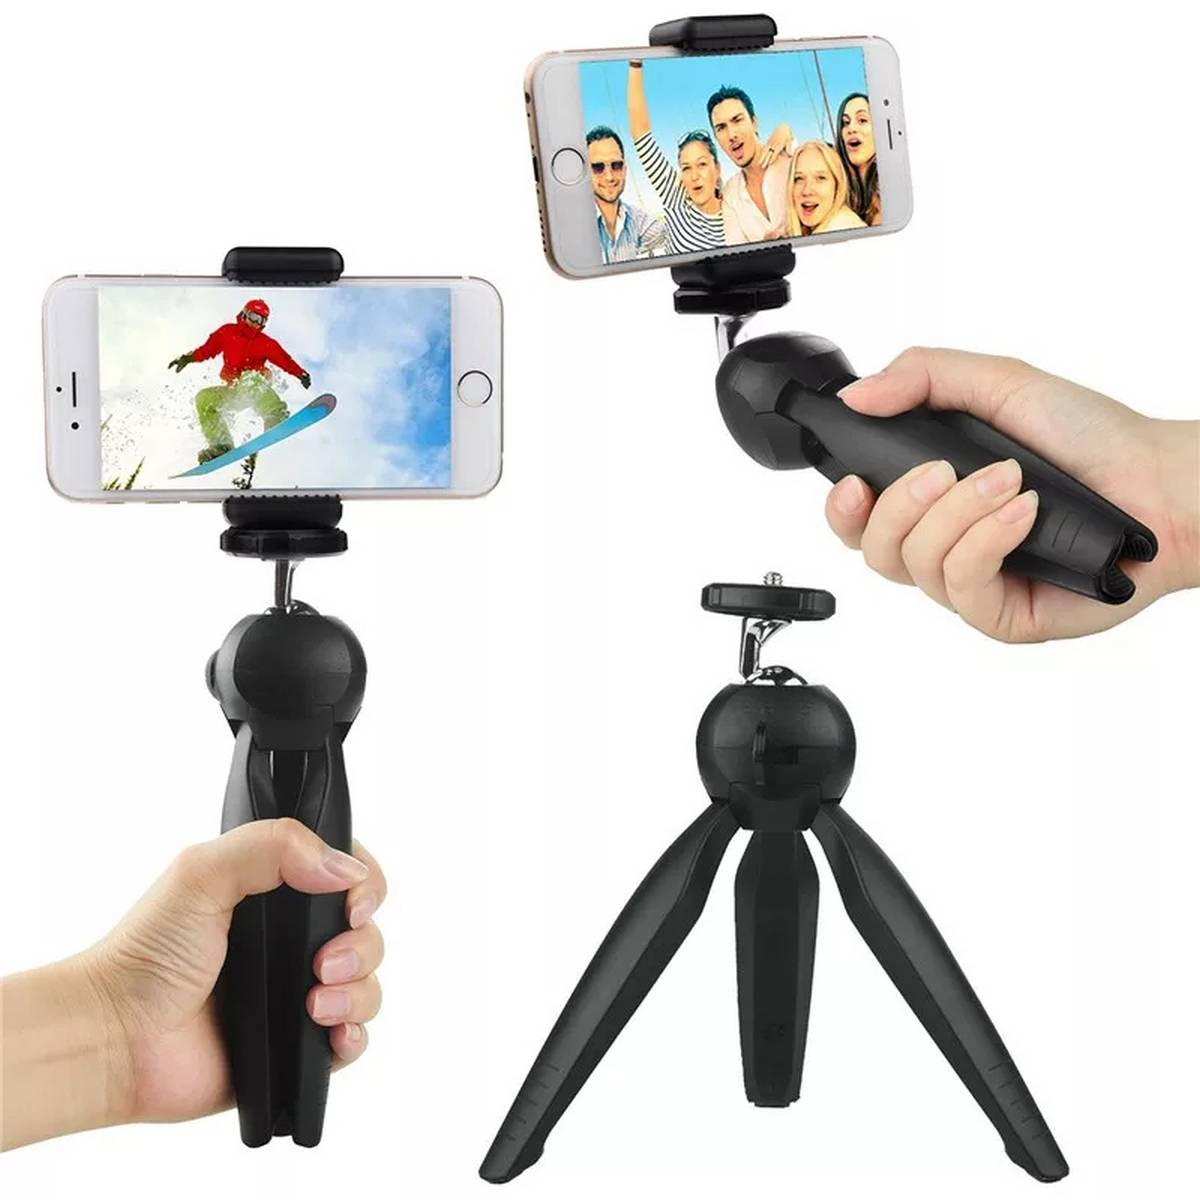 Mini Tripod Stand Mobile Mount Clip YT-228 for Digital Camera DSLR iPhone Android Smartphones Selfie Sticks Universal Mobile Holder